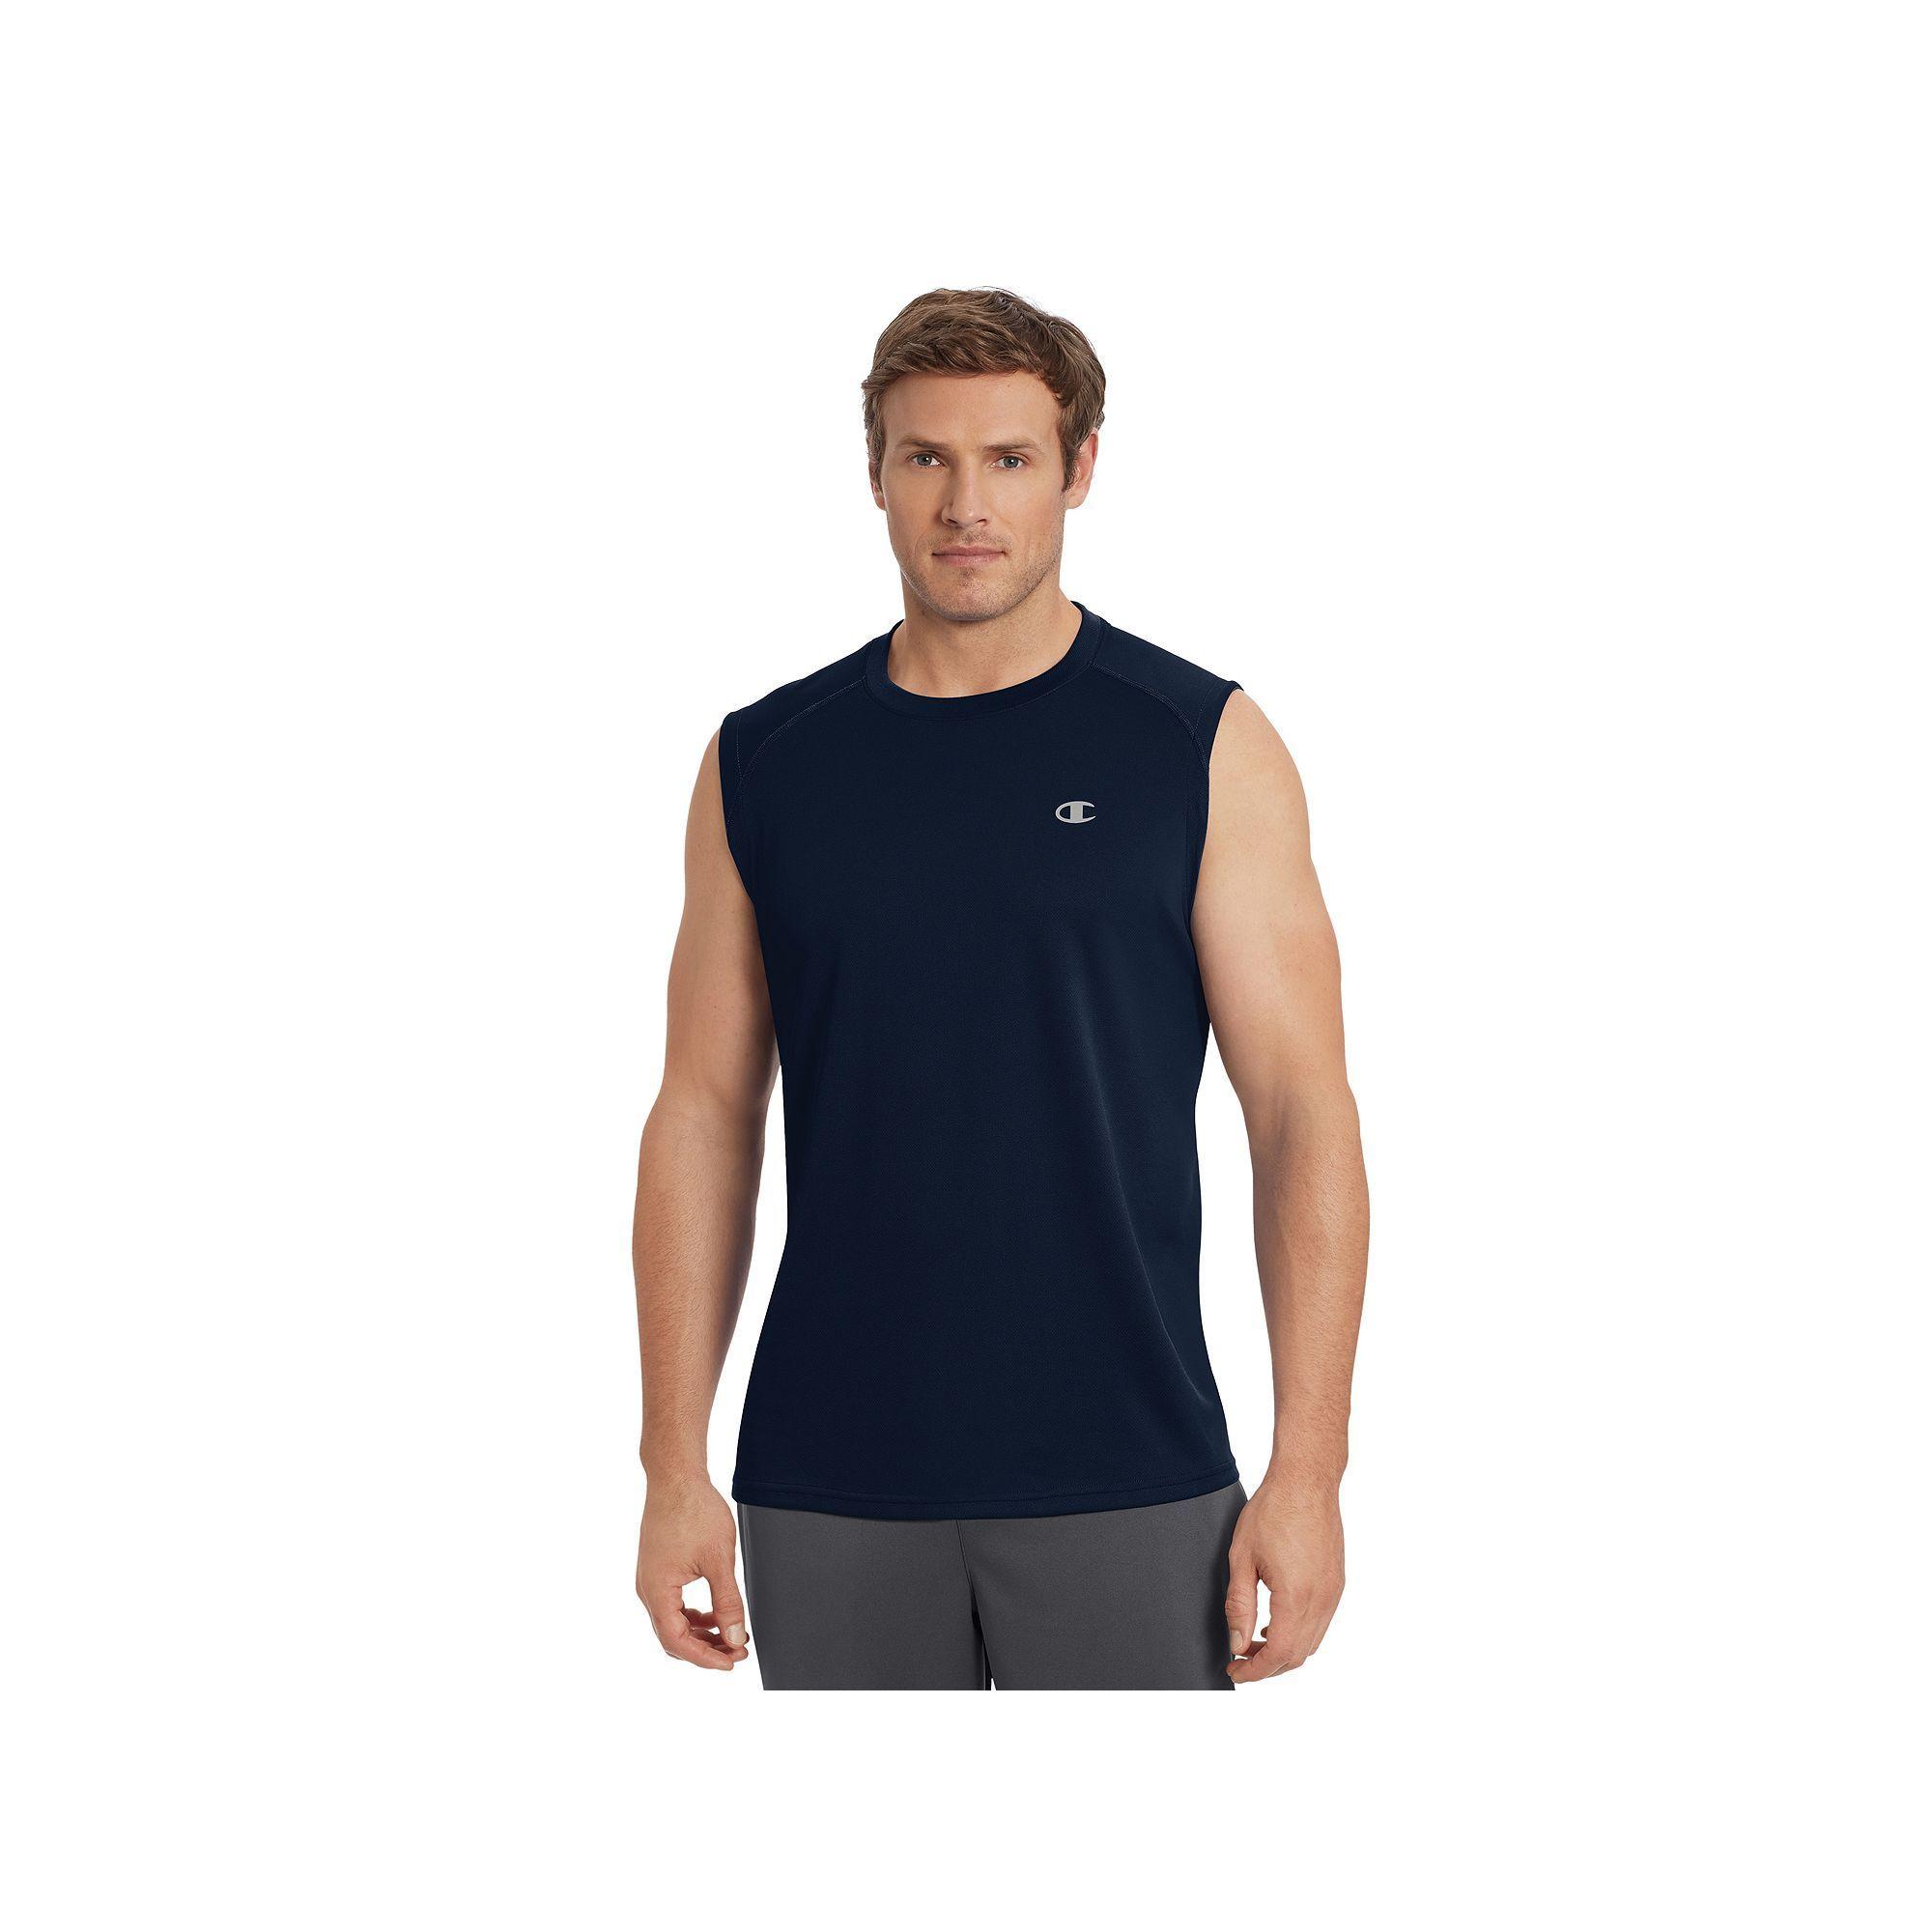 83d1cd32 Men's Champion Vapor Performance Muscle Tee, Size: Medium, Blue (Navy)